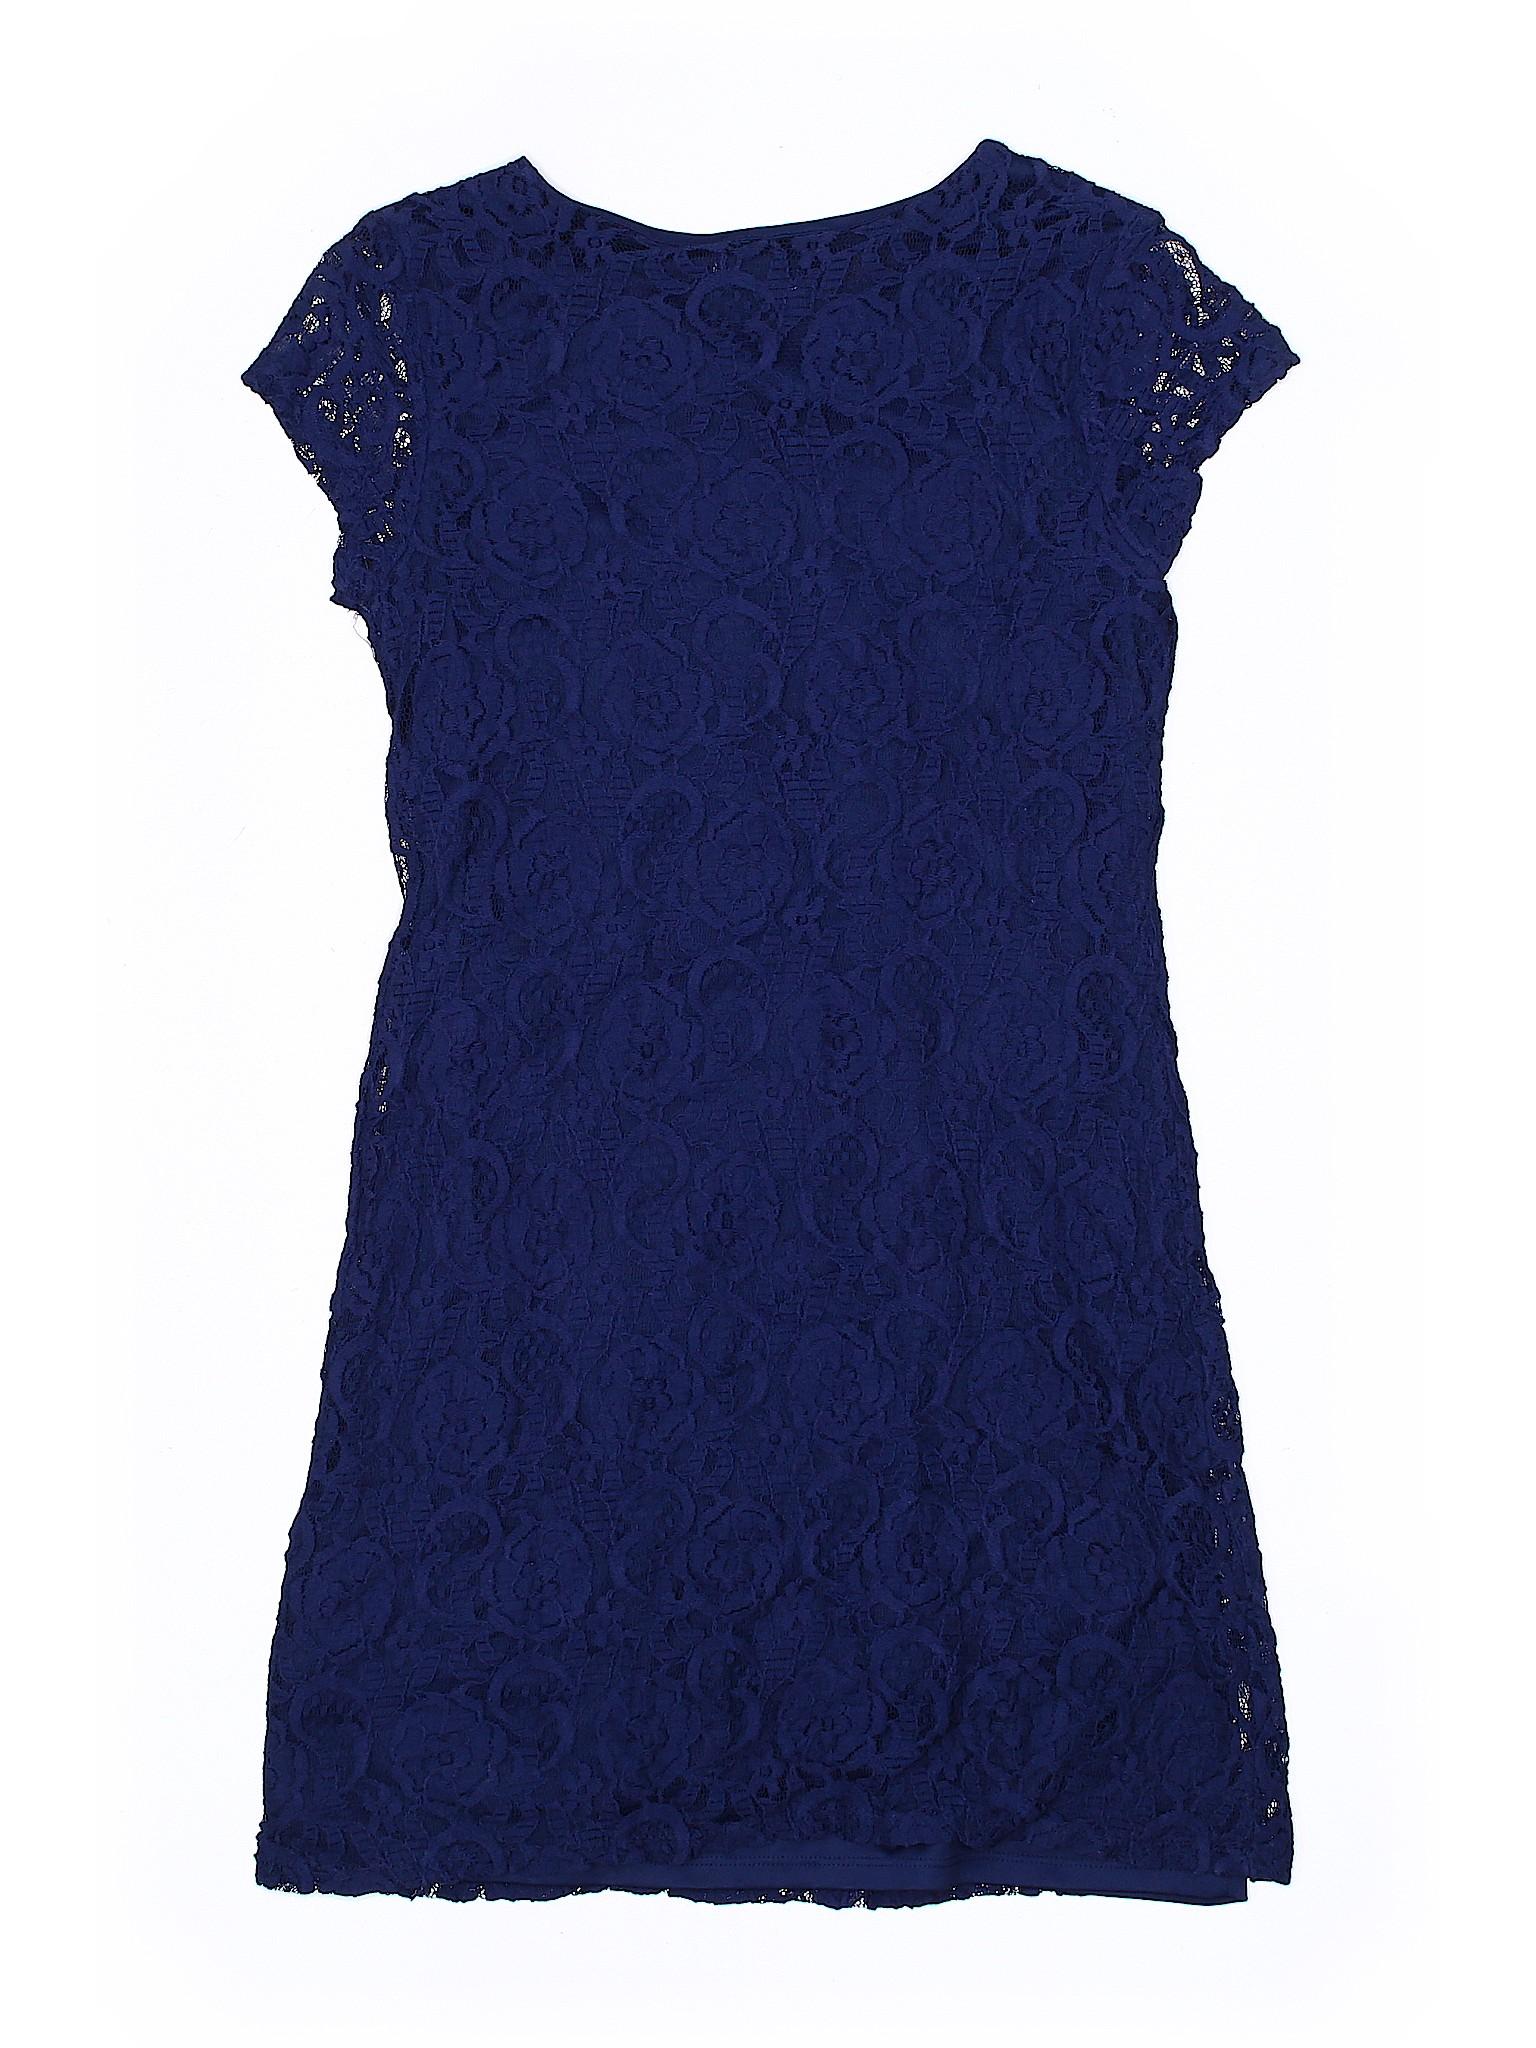 Casual Xhilaration Boutique Boutique Casual Boutique Dress winter Xhilaration winter Dress AqTBwZ